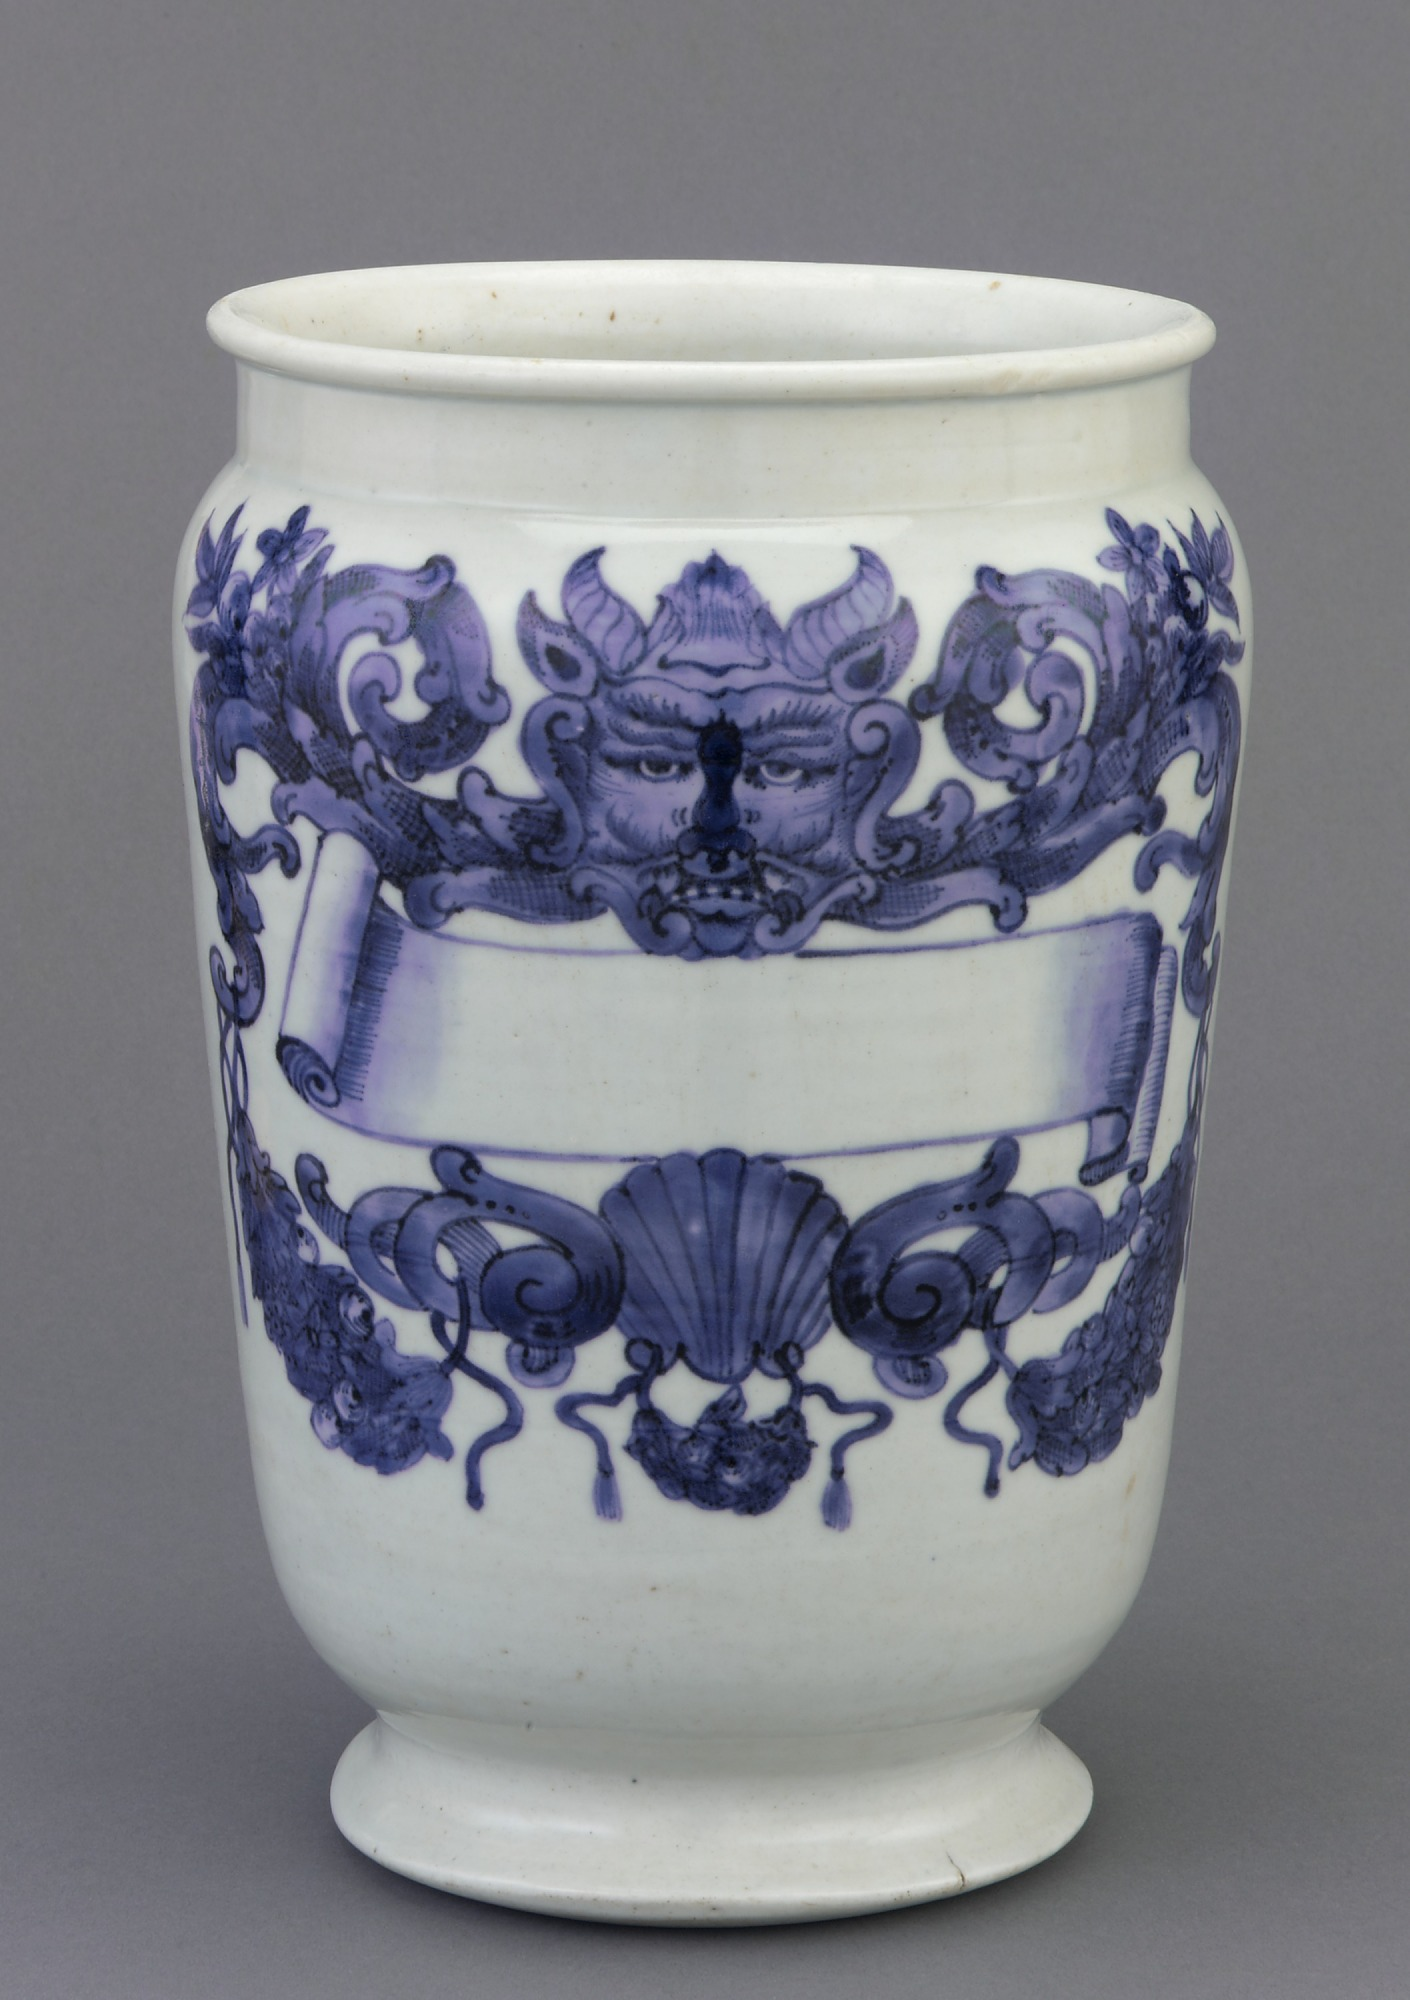 Arita ware drug pot (albarello) with European decoration